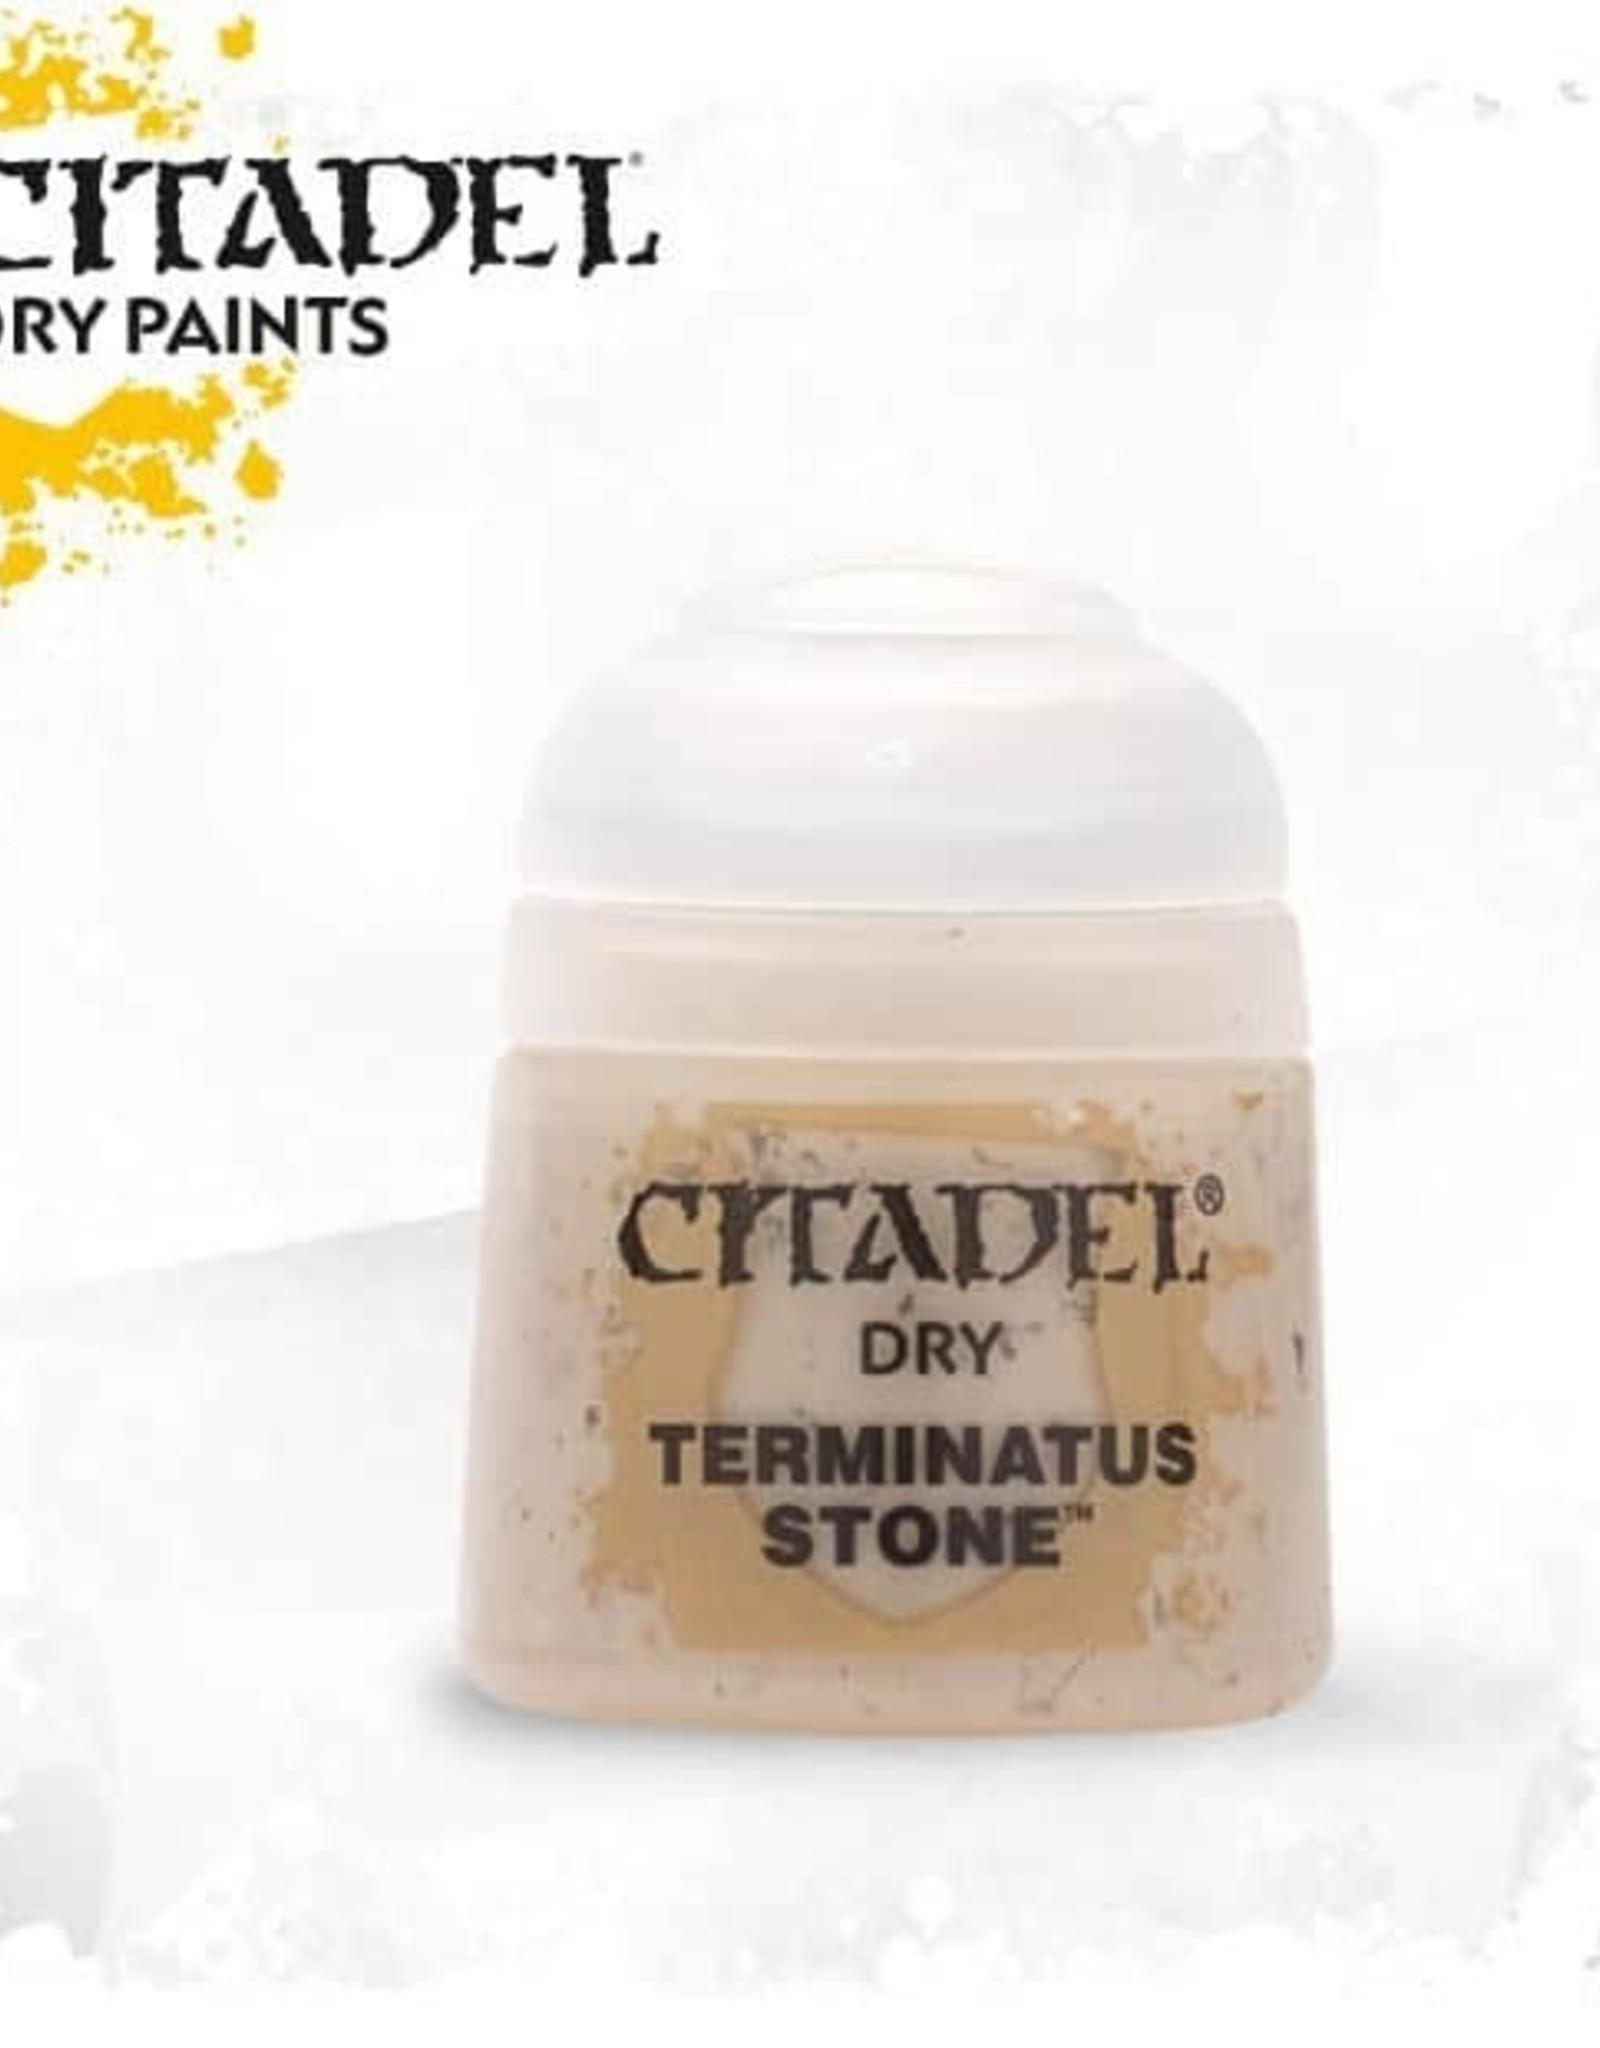 Games Workshop Citadel Paint: Dry - Terminatus Stone